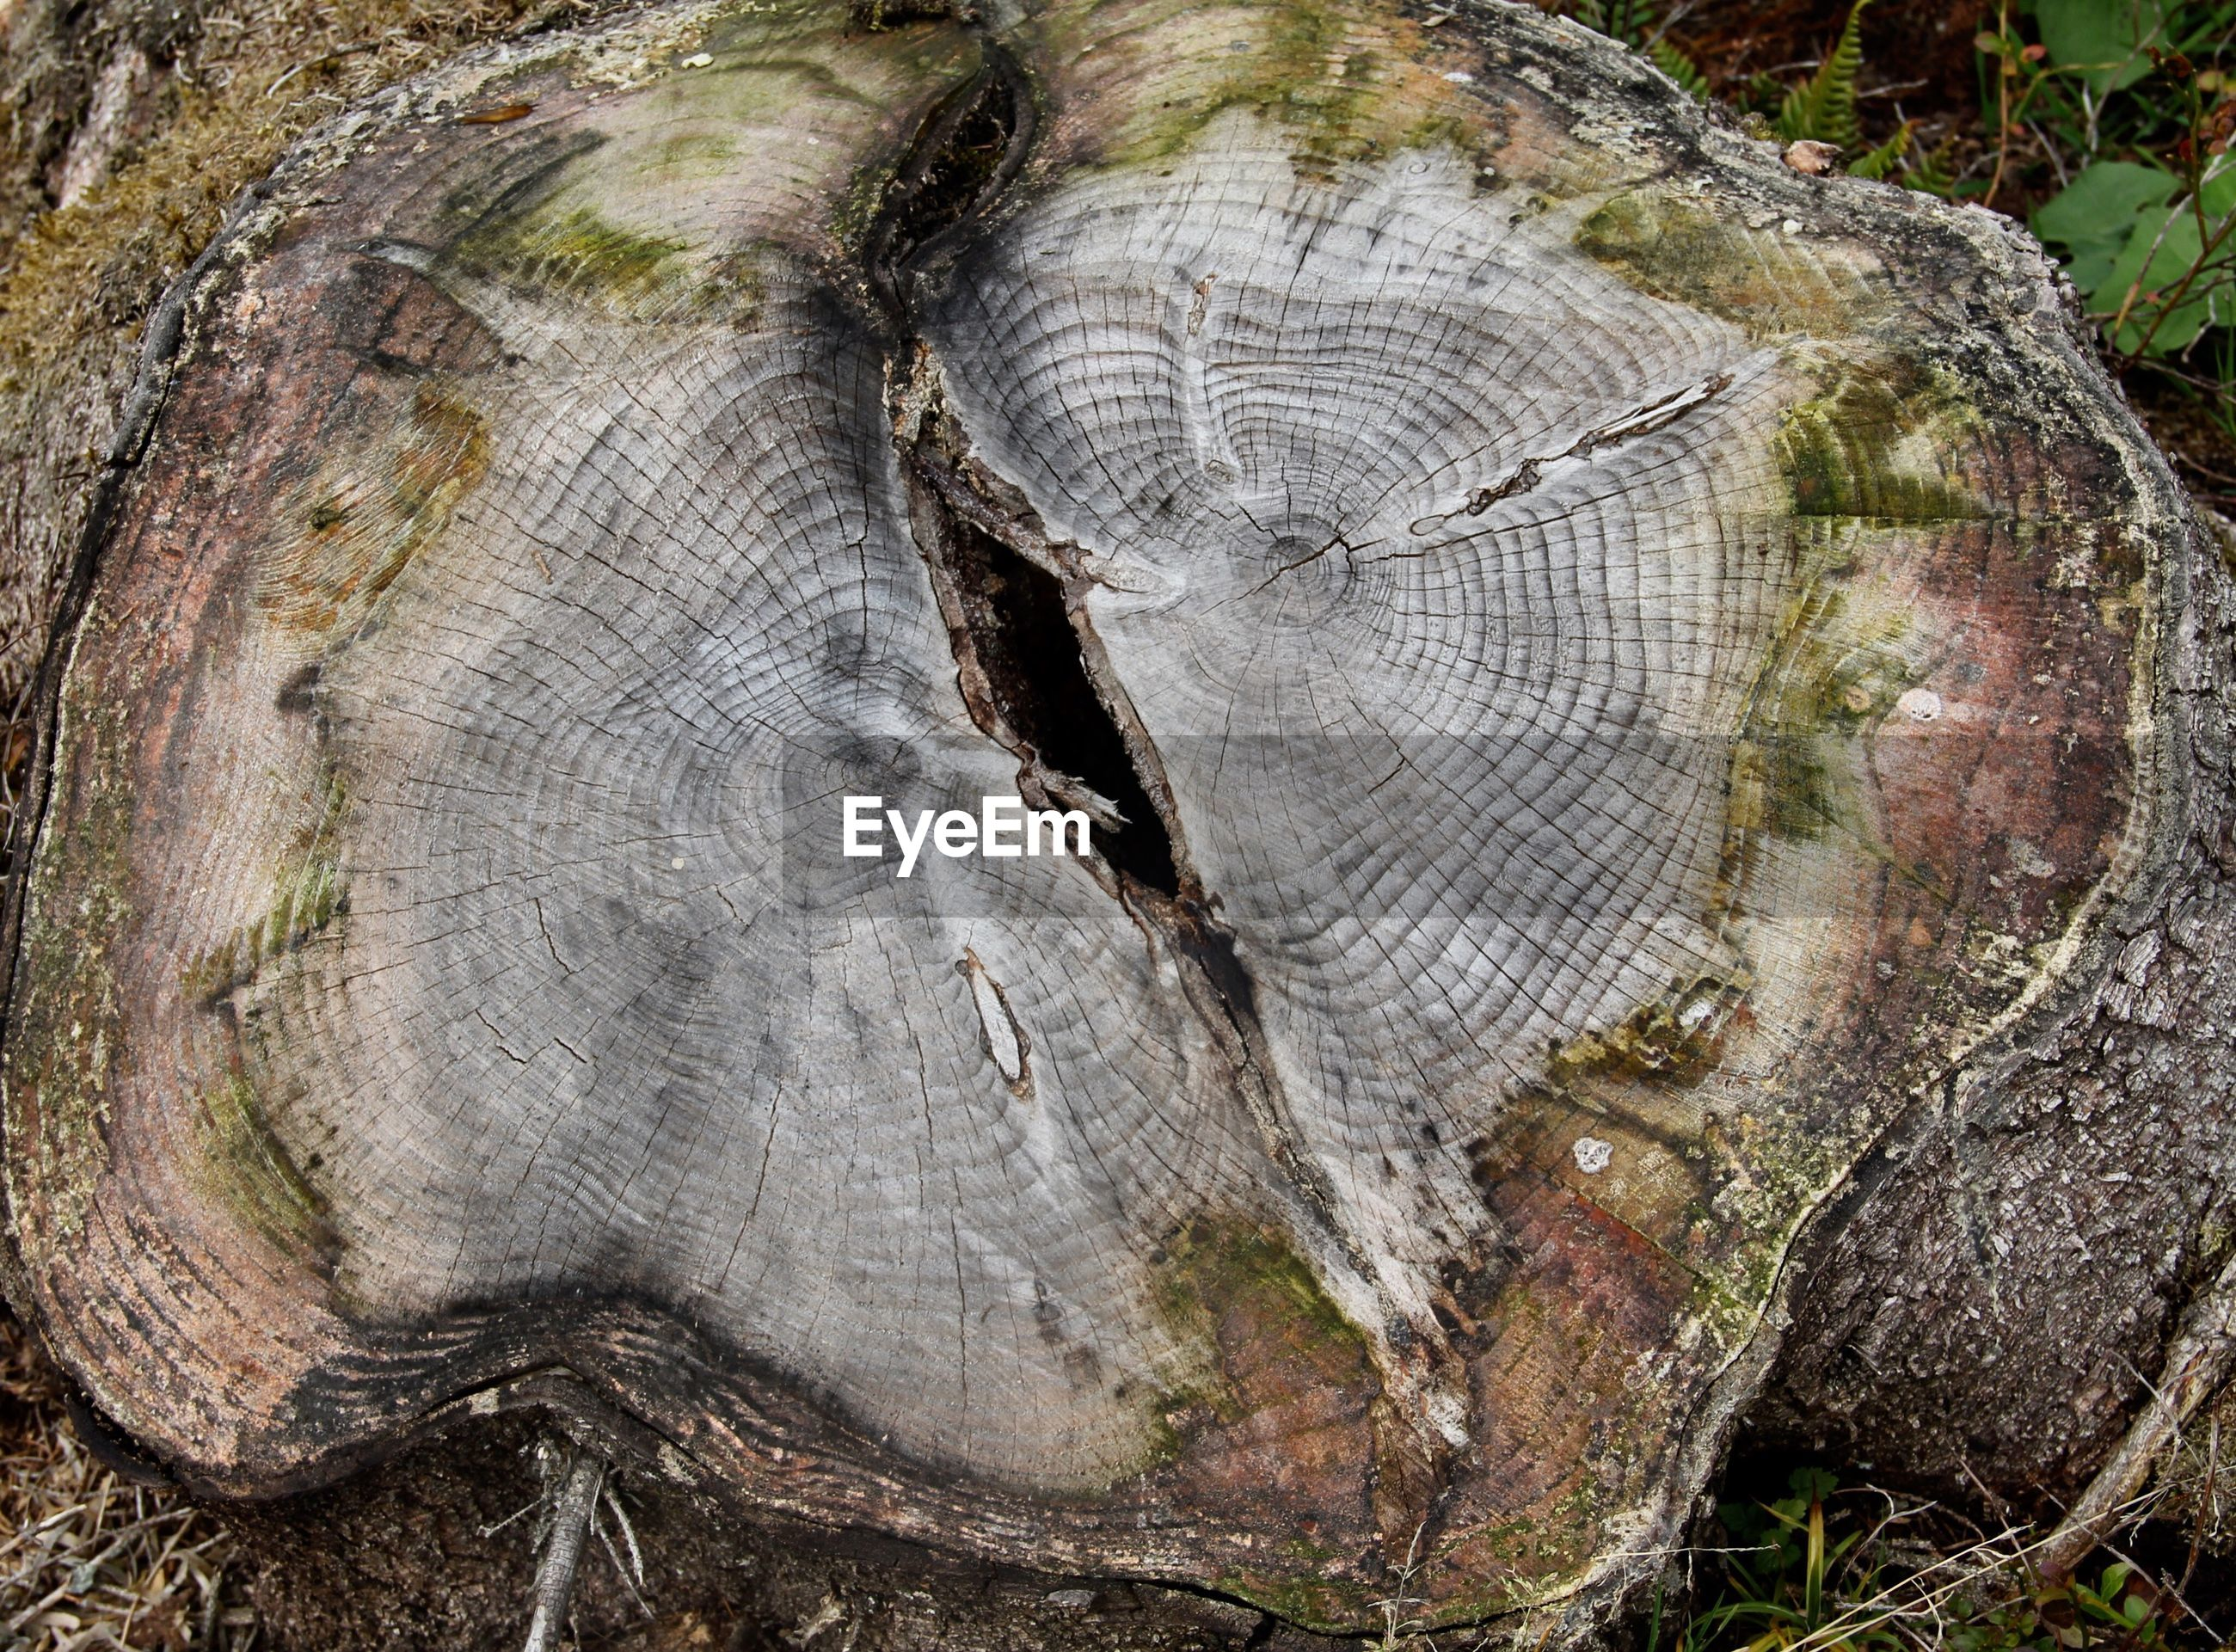 CLOSE-UP OF TREE STUMP ON LOG